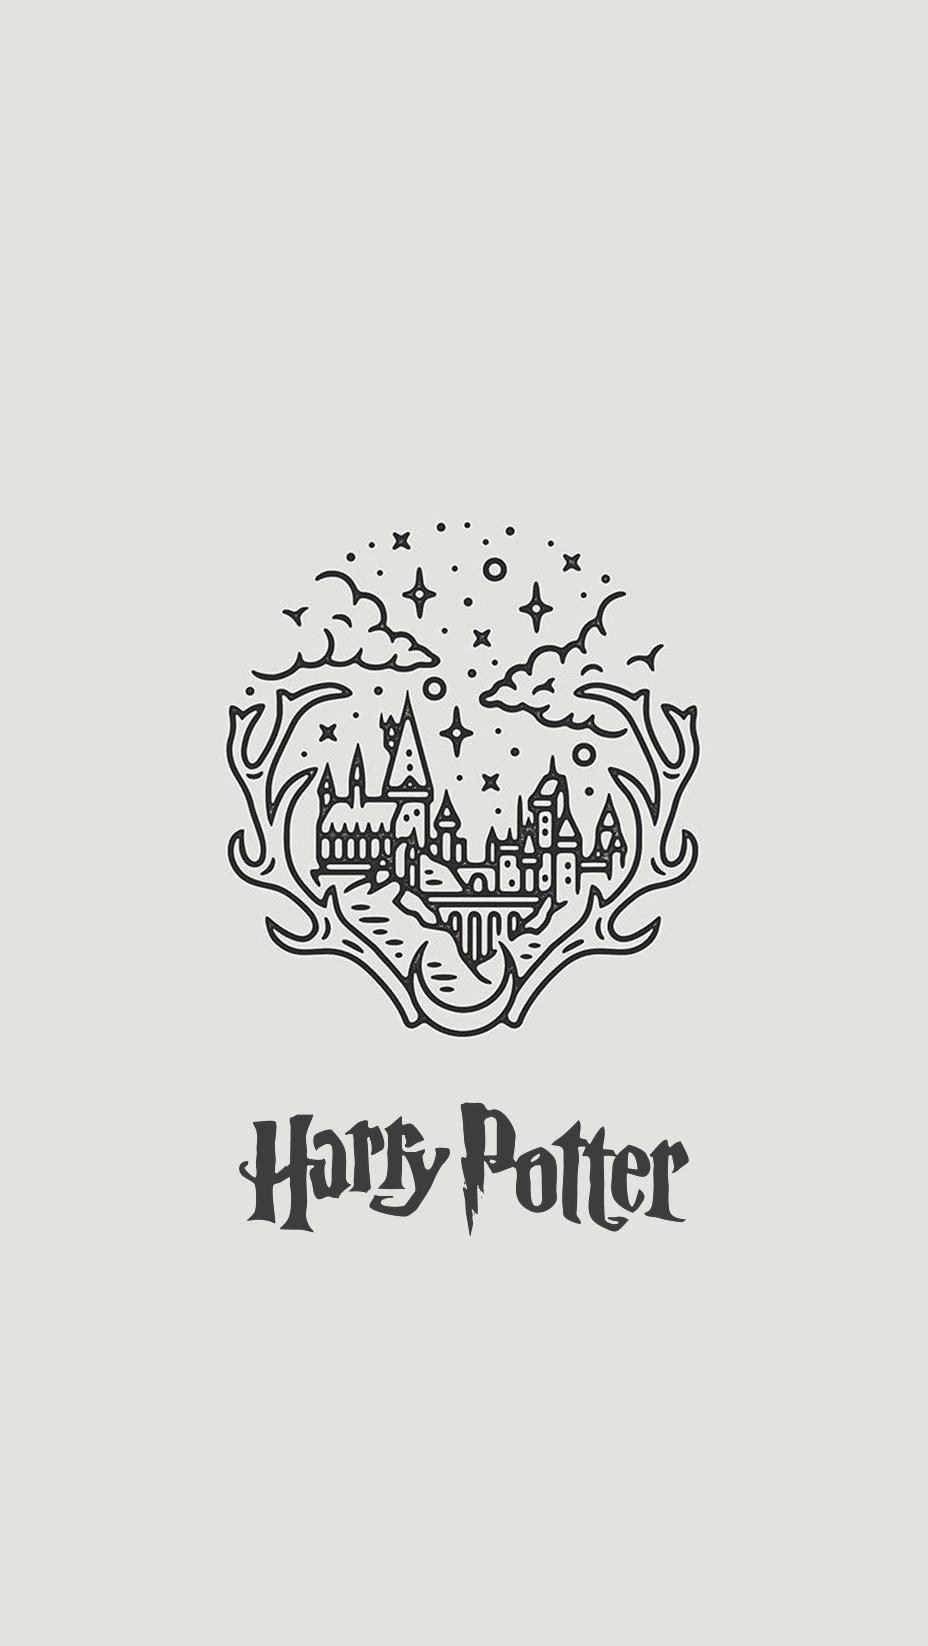 fa642d9b05757 Harry Potter Harry Potter Artwork, Harry Potter Wallpaper, Harry Potter  Drawings, Harry Potter